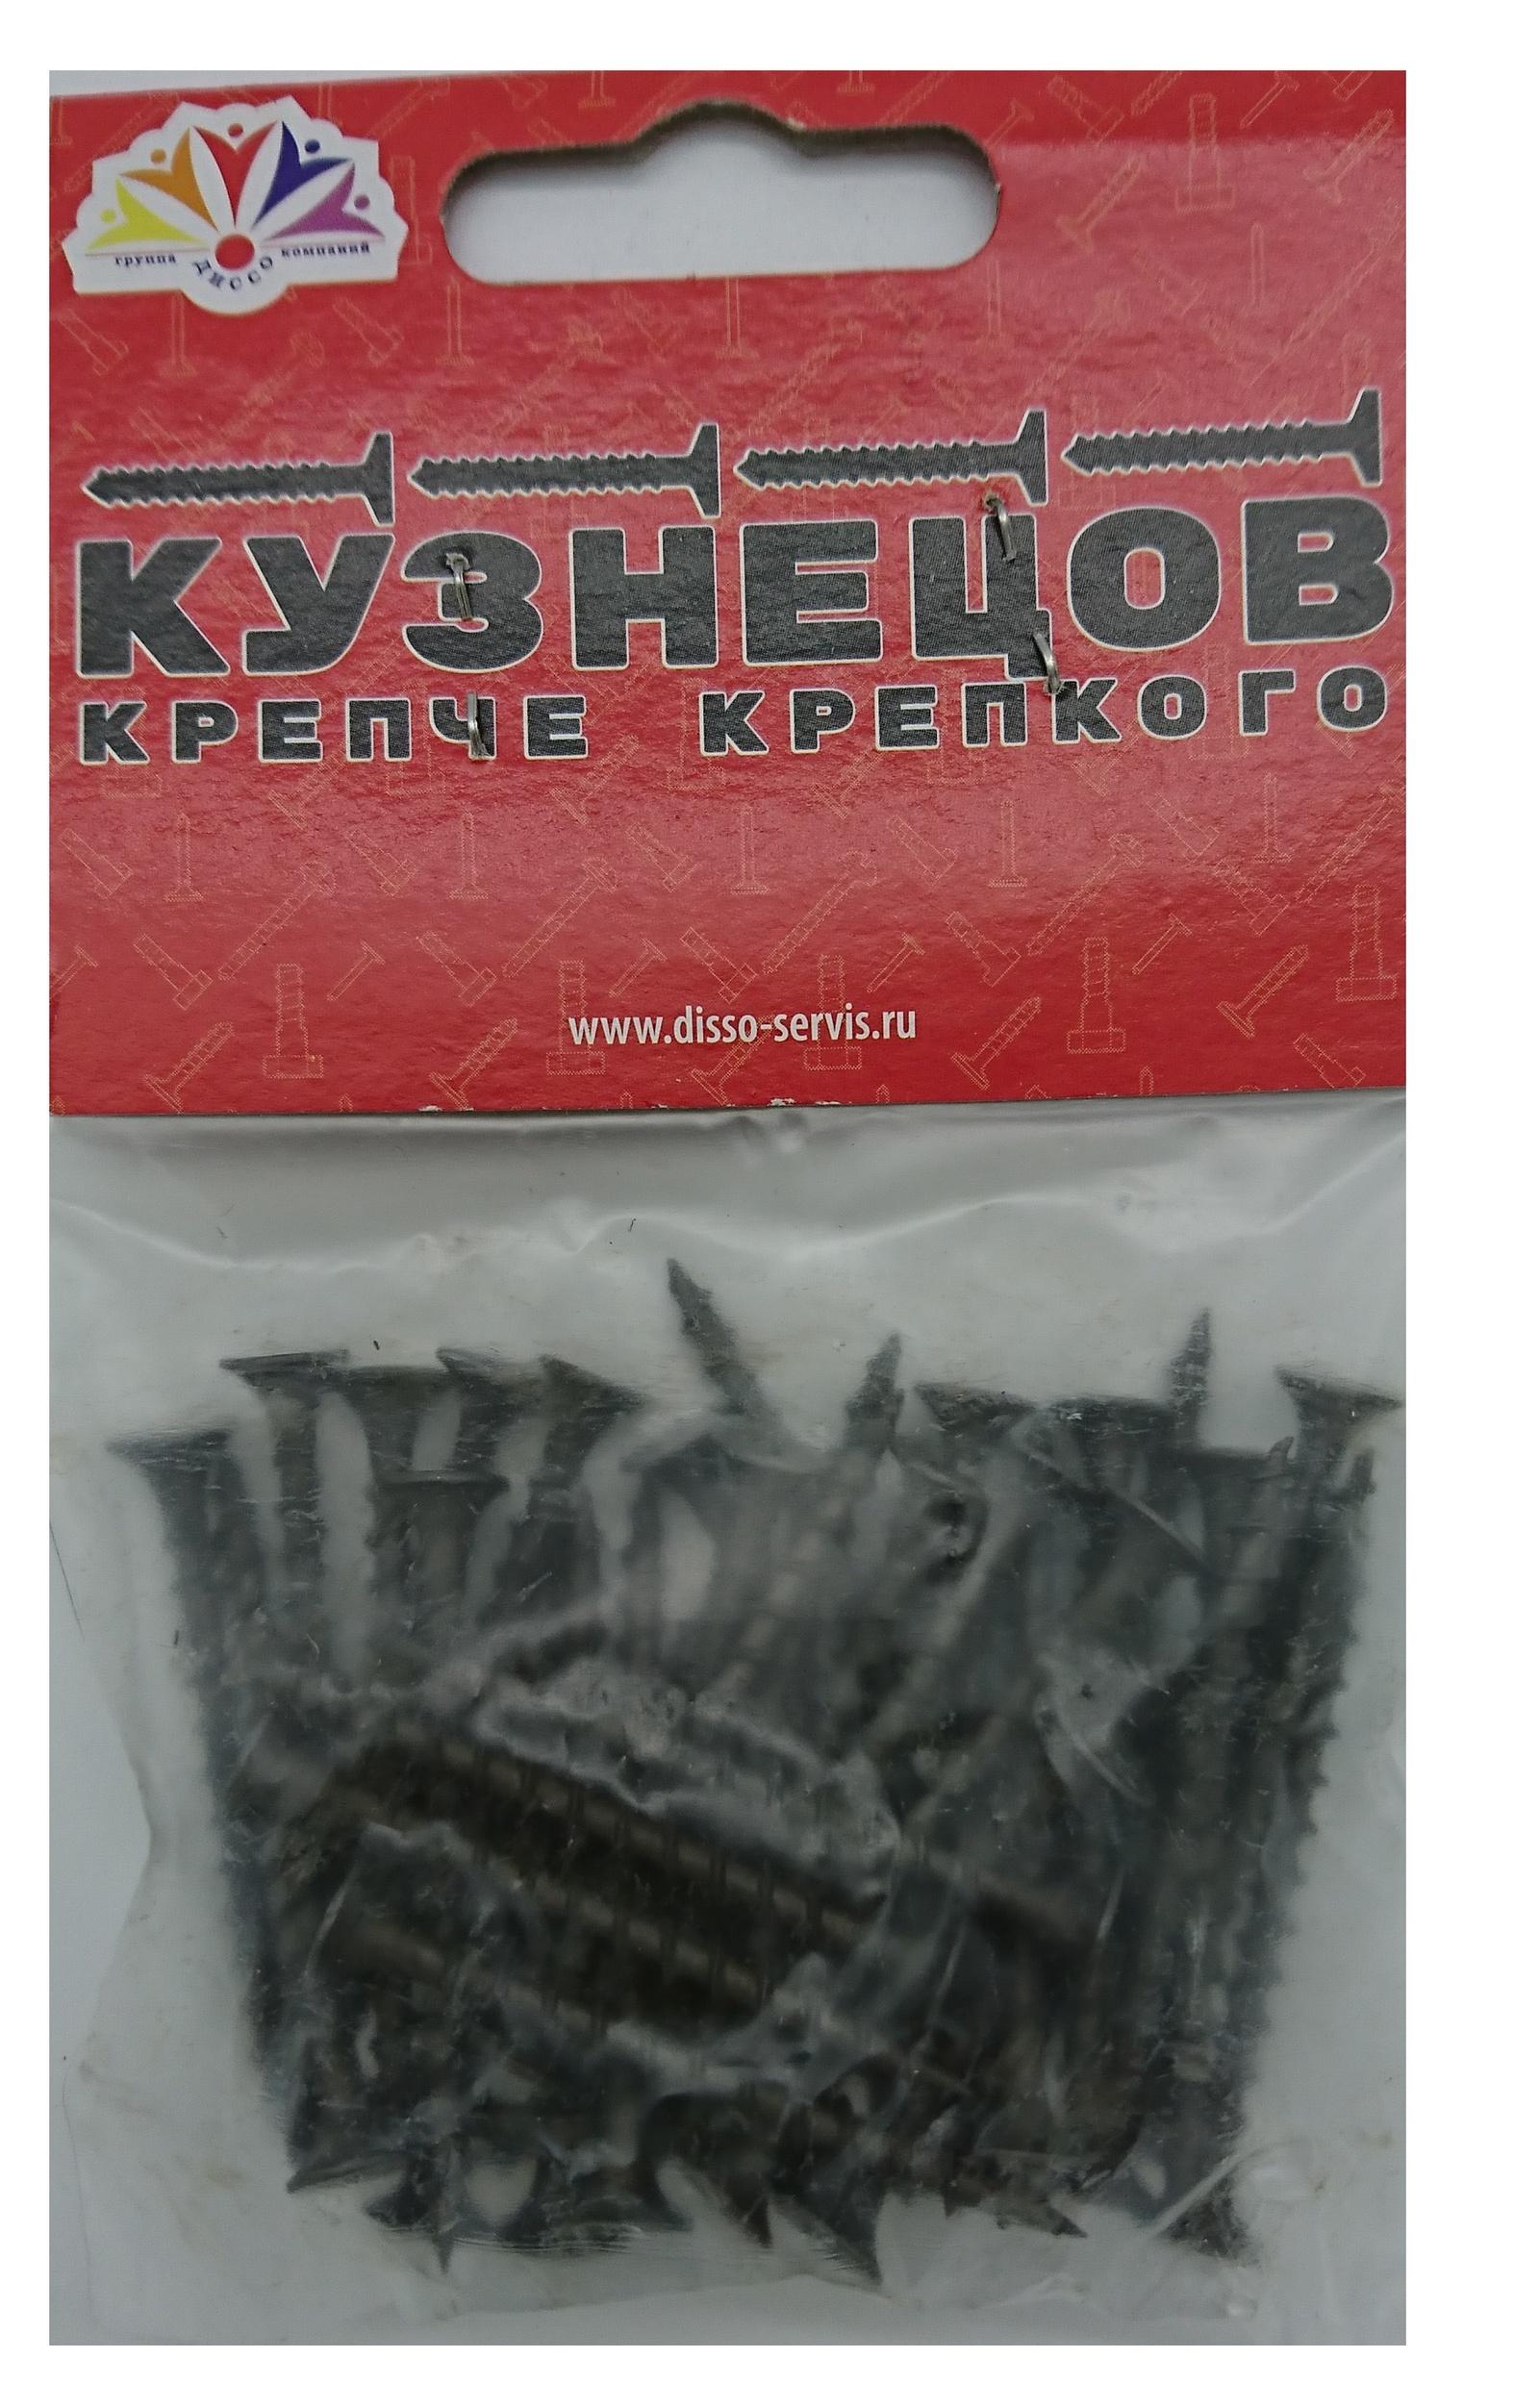 Саморез Кузнецов гипсокартон-дерево 3,5х45 (40 шт. в упаковке) цена 2017